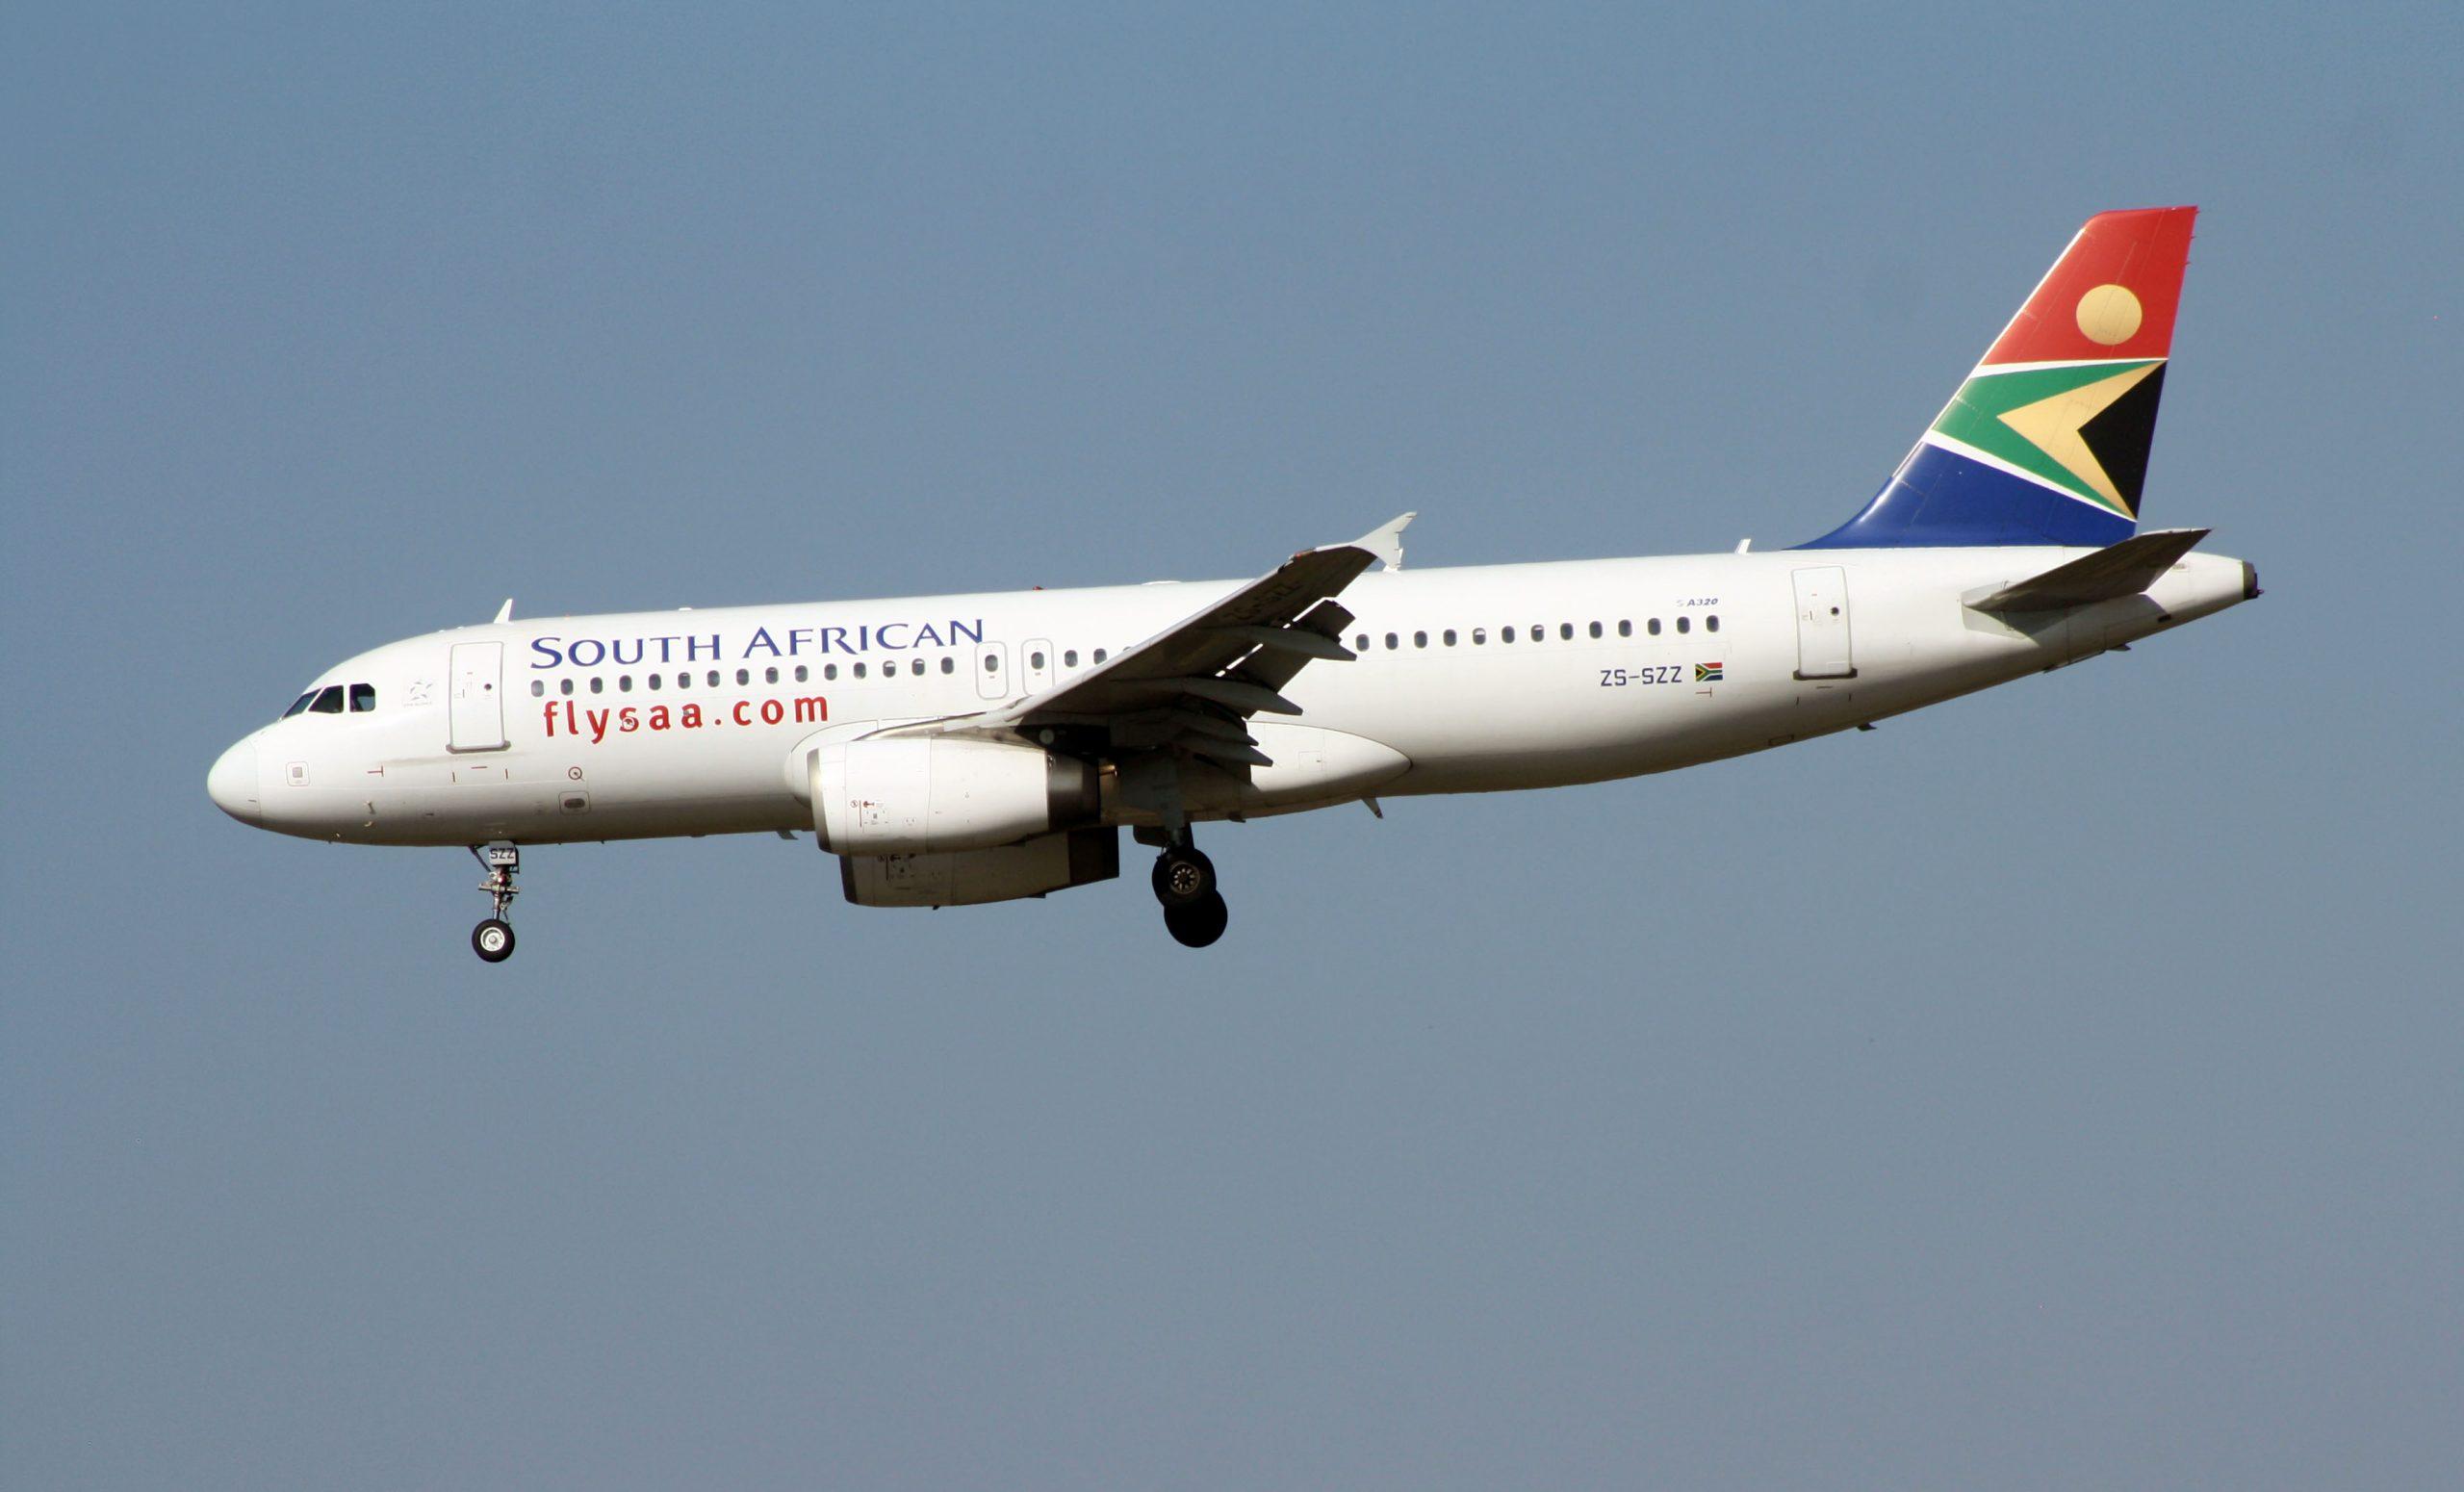 En Airbus A320-200 fra South African Airways. Foto: Bob Adams, CC 2.0